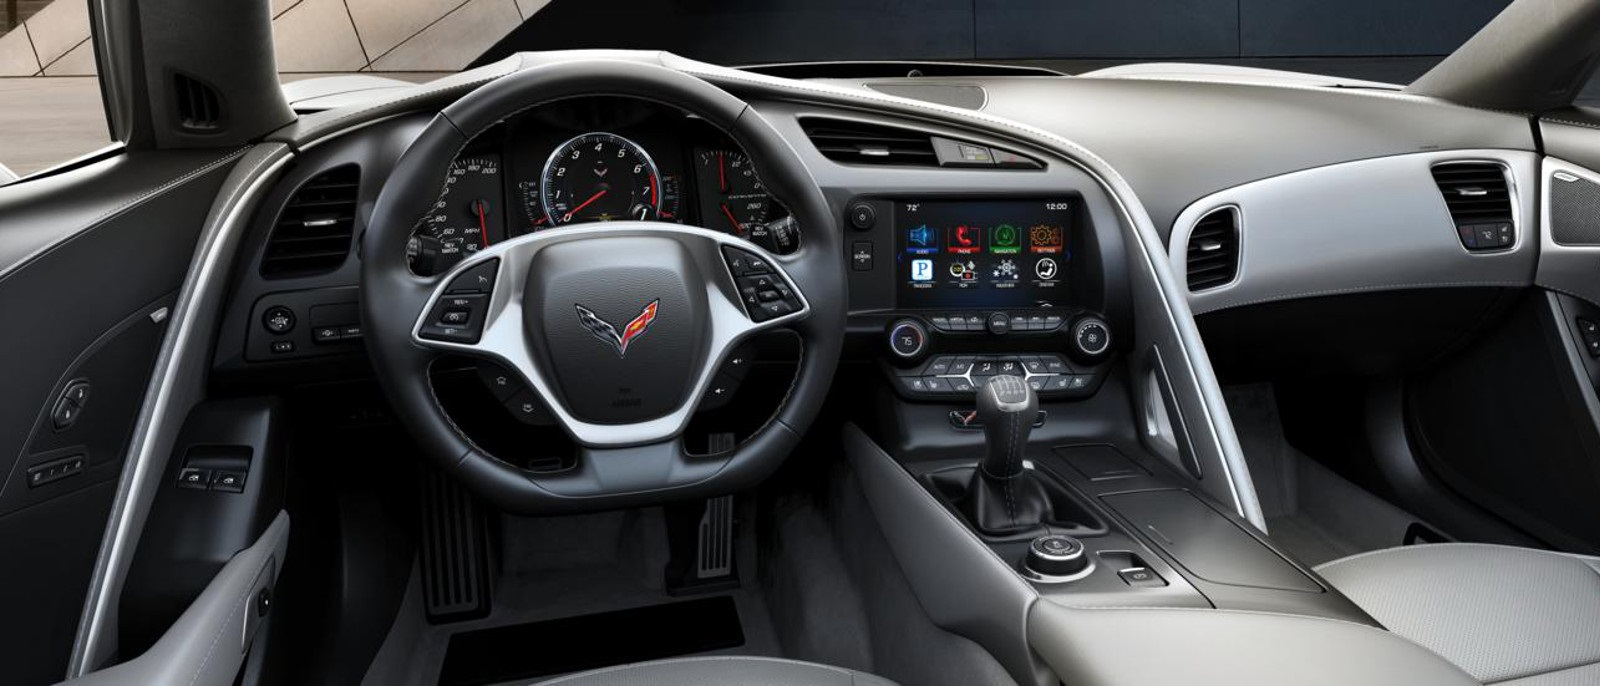 2016 Corvette Stingray Front Interior